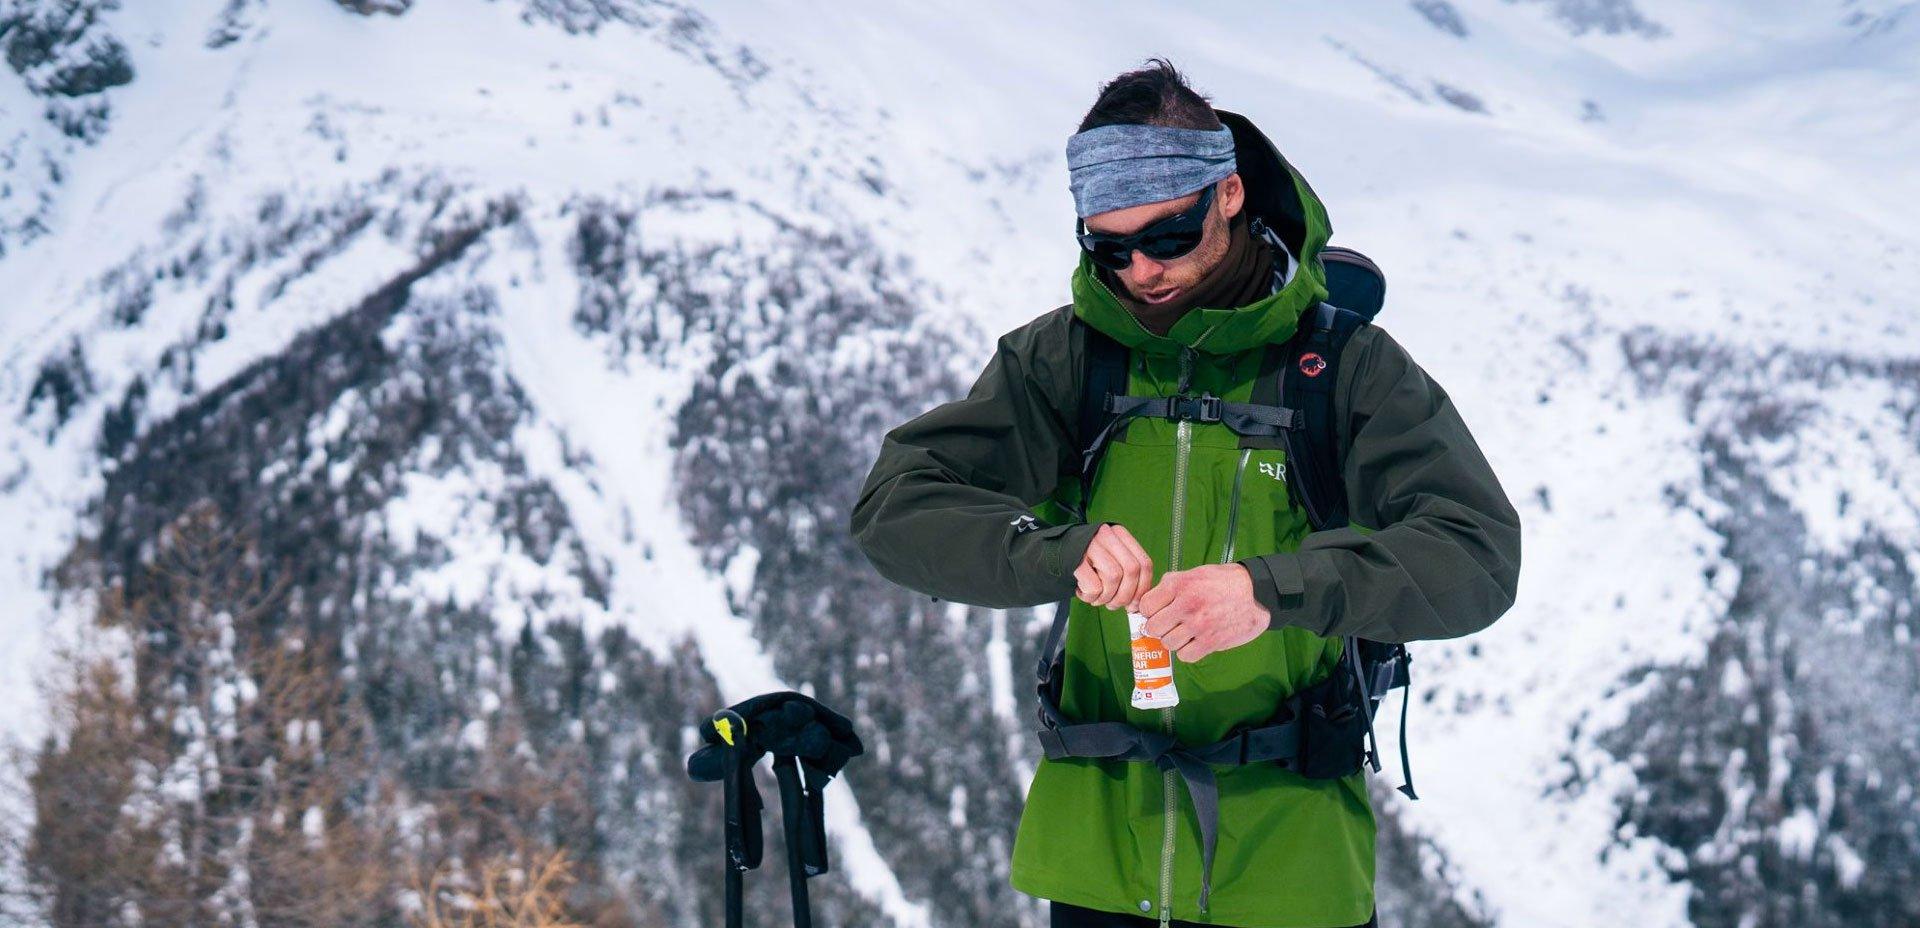 barretta energetica crown health in montagna